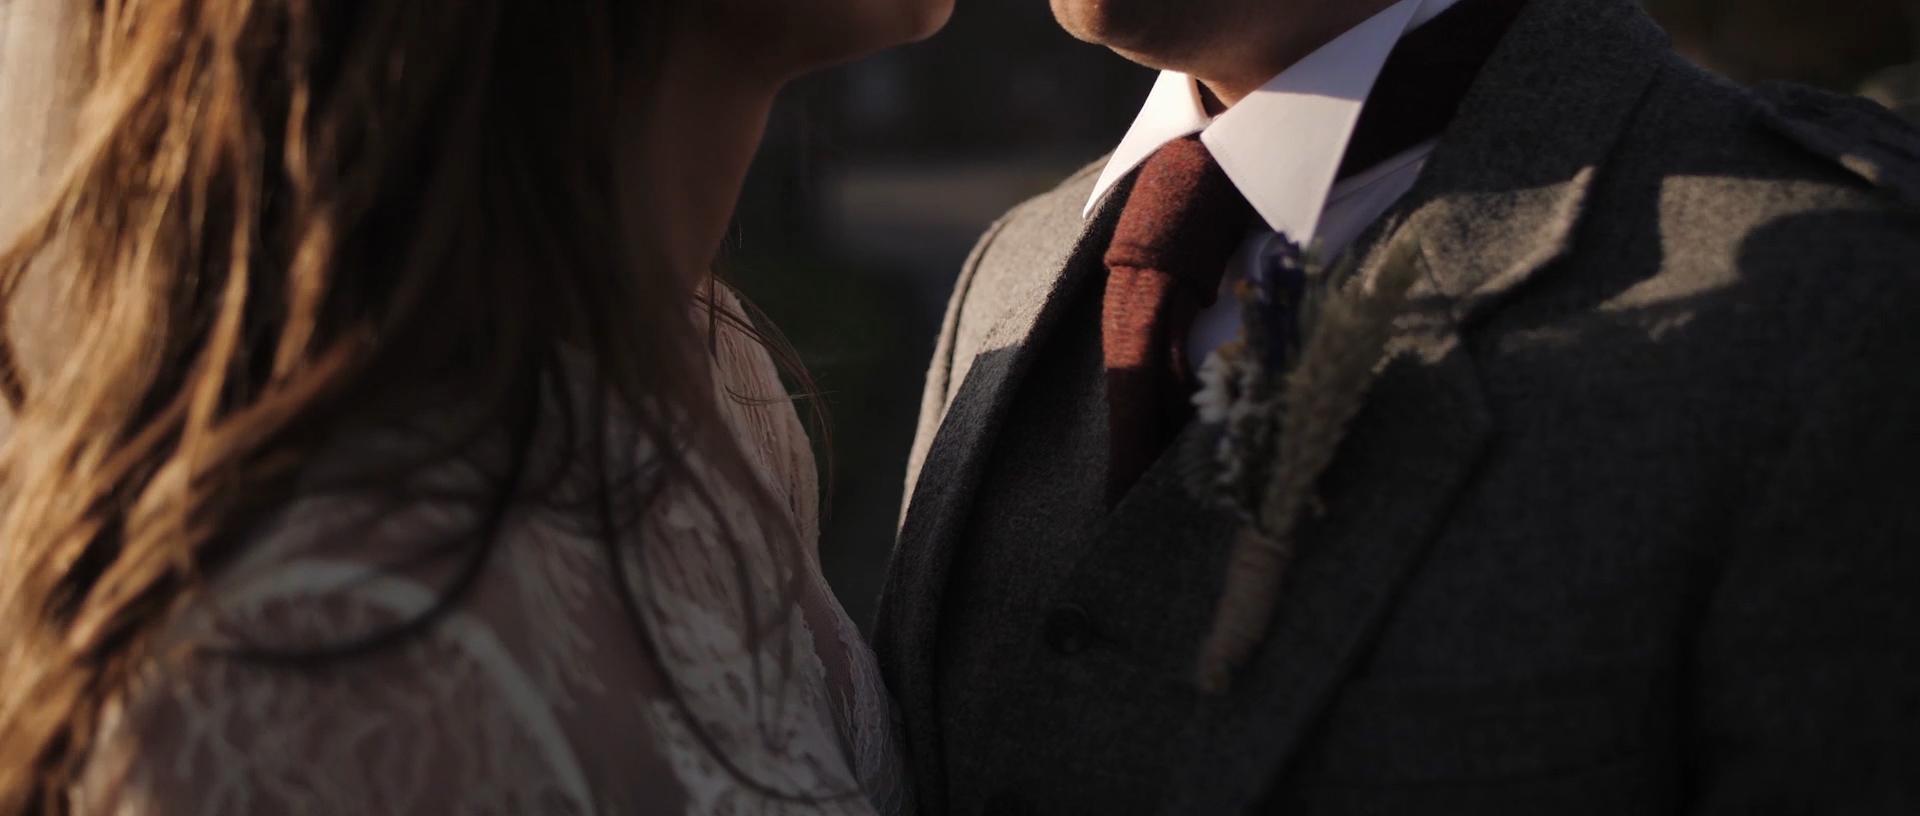 ayr-wedding-videographer_LL_04.jpg